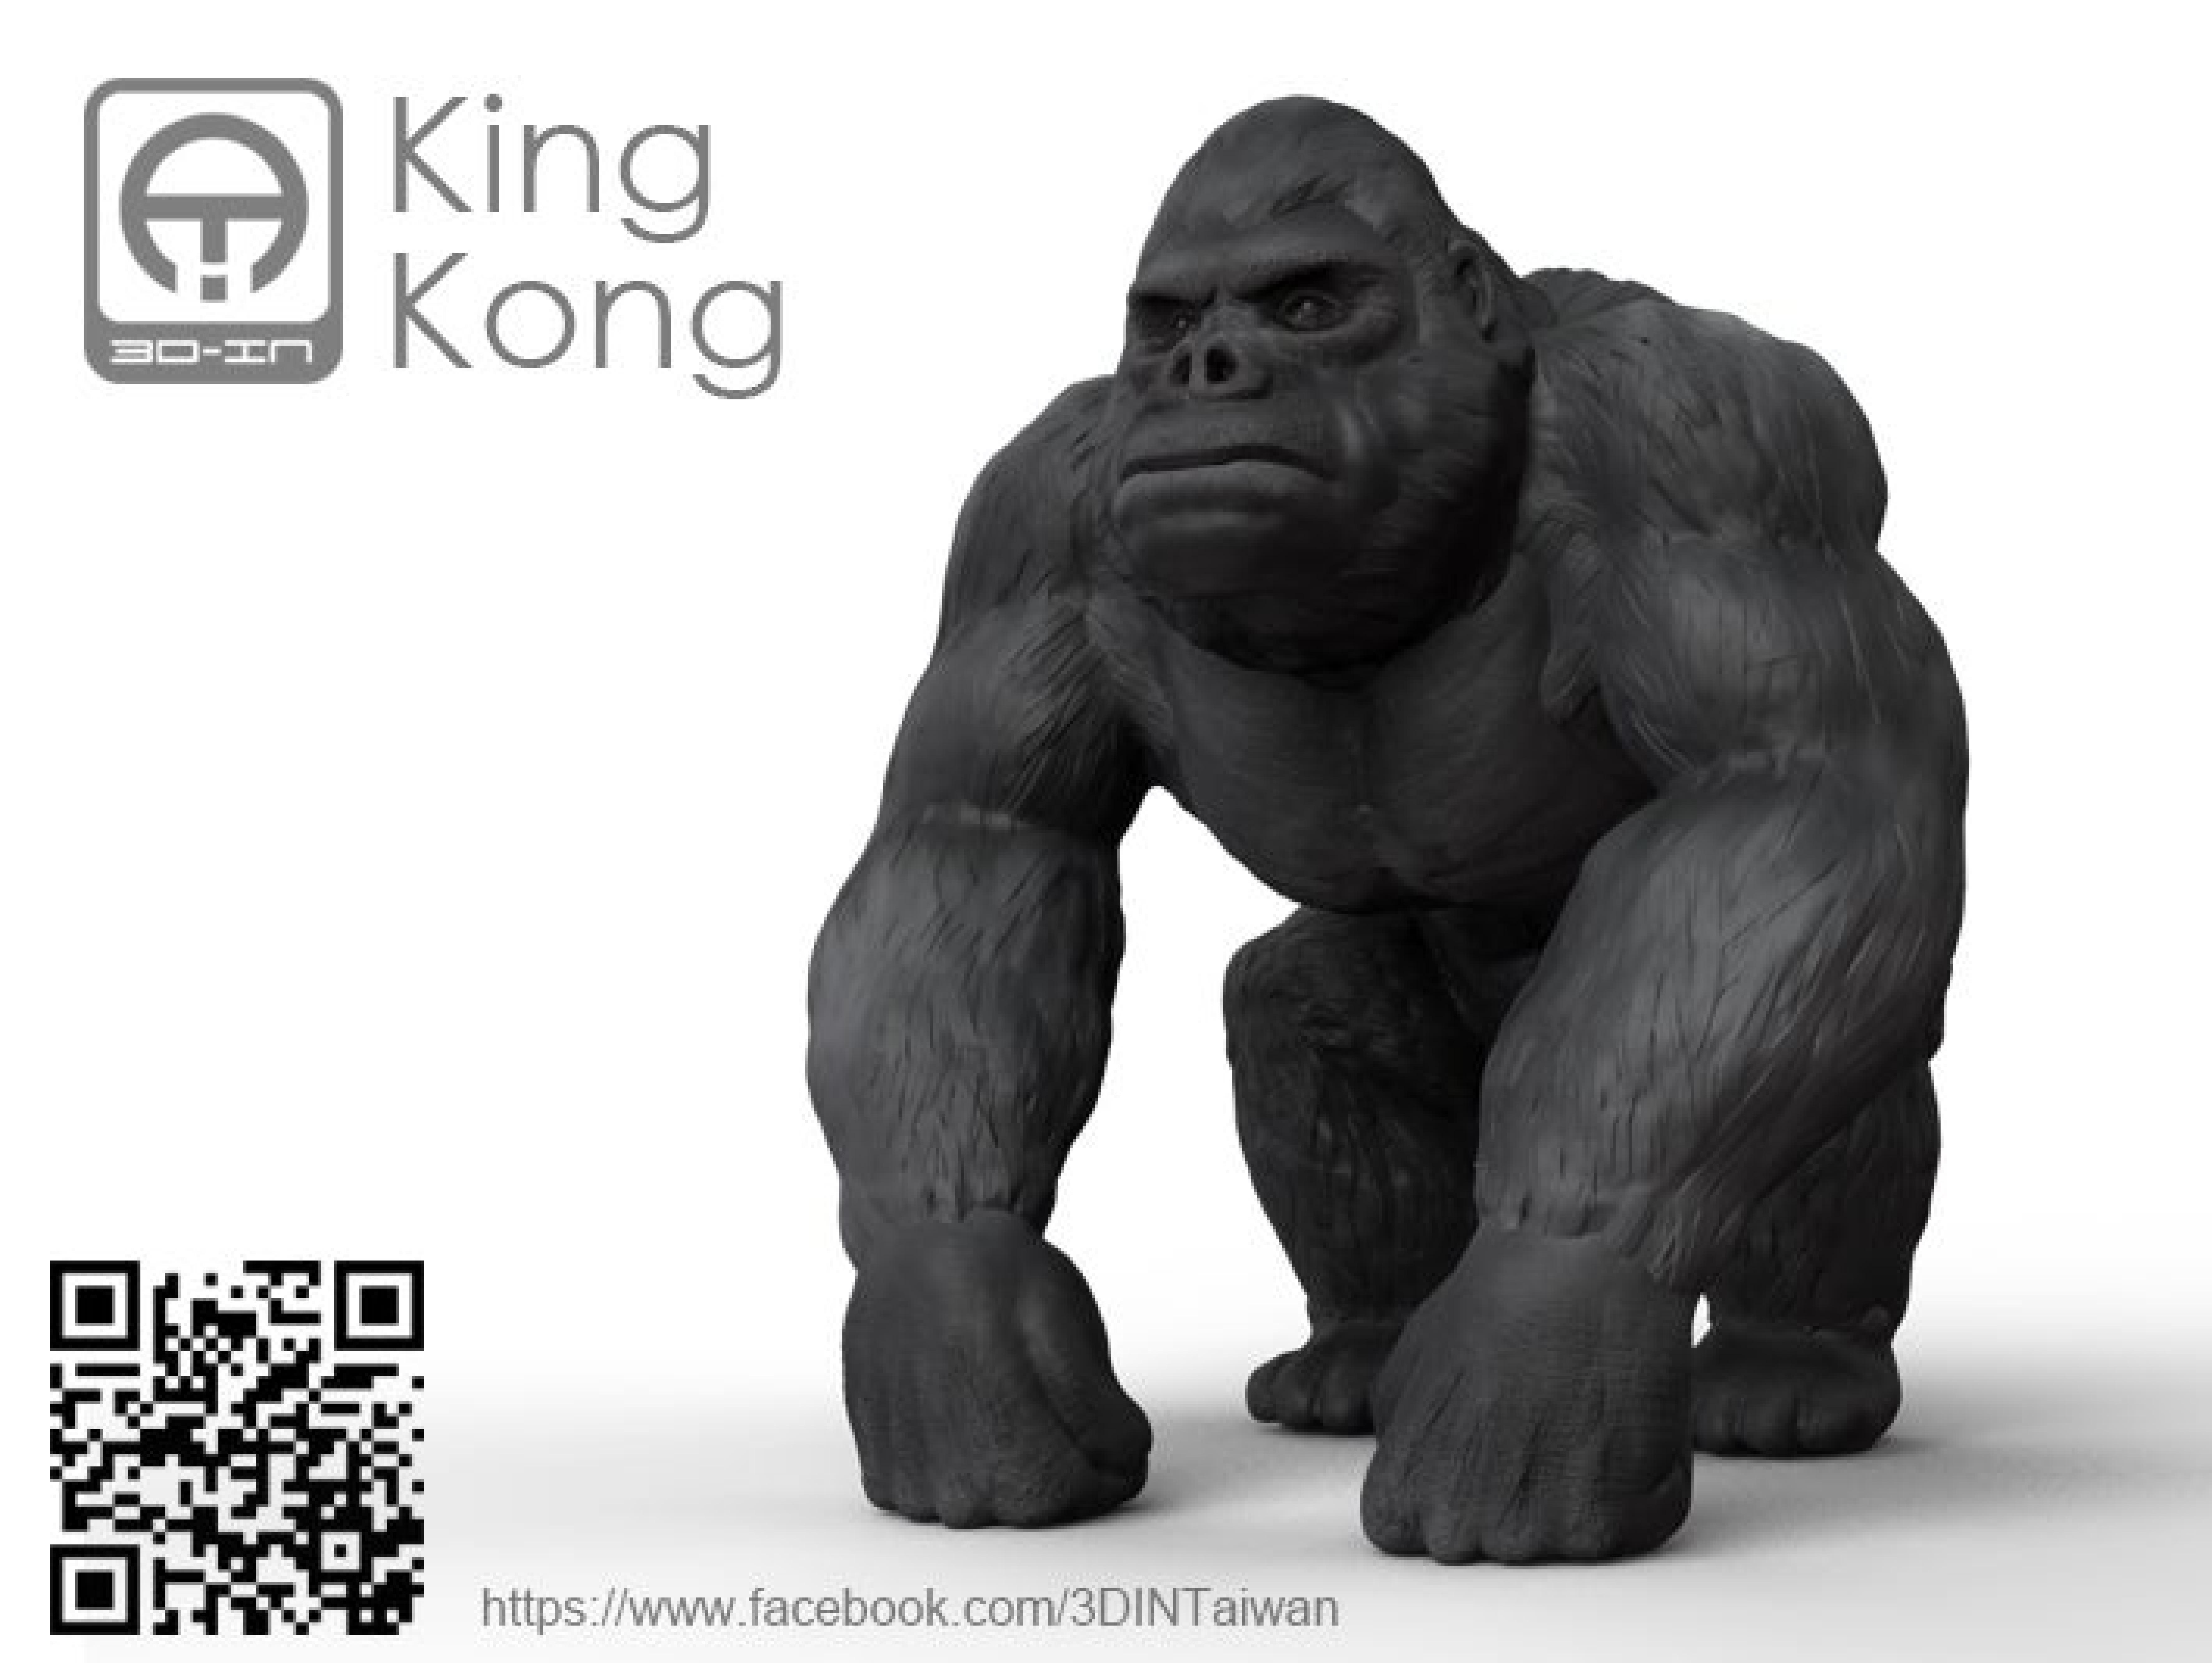 King Kong Masaüstü Dekoratif Biblo Dekor